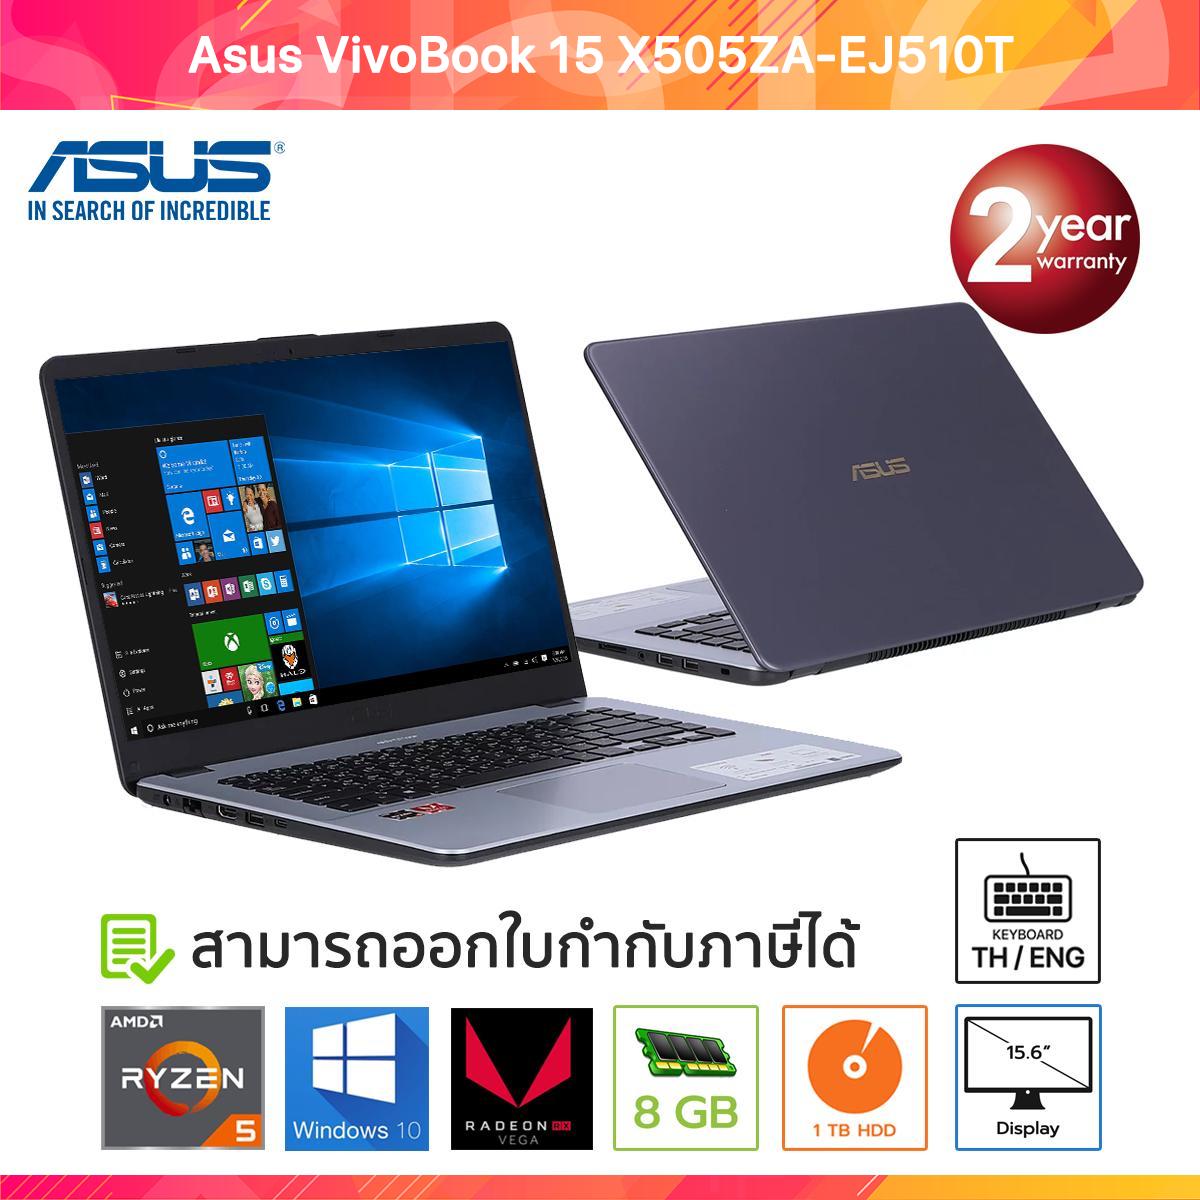 Asus VivoBook 15 X505ZA-EJ510T AMD Ryzen 5 2500U/8GB/1TB/15.6/Win10 (Dark Grey)